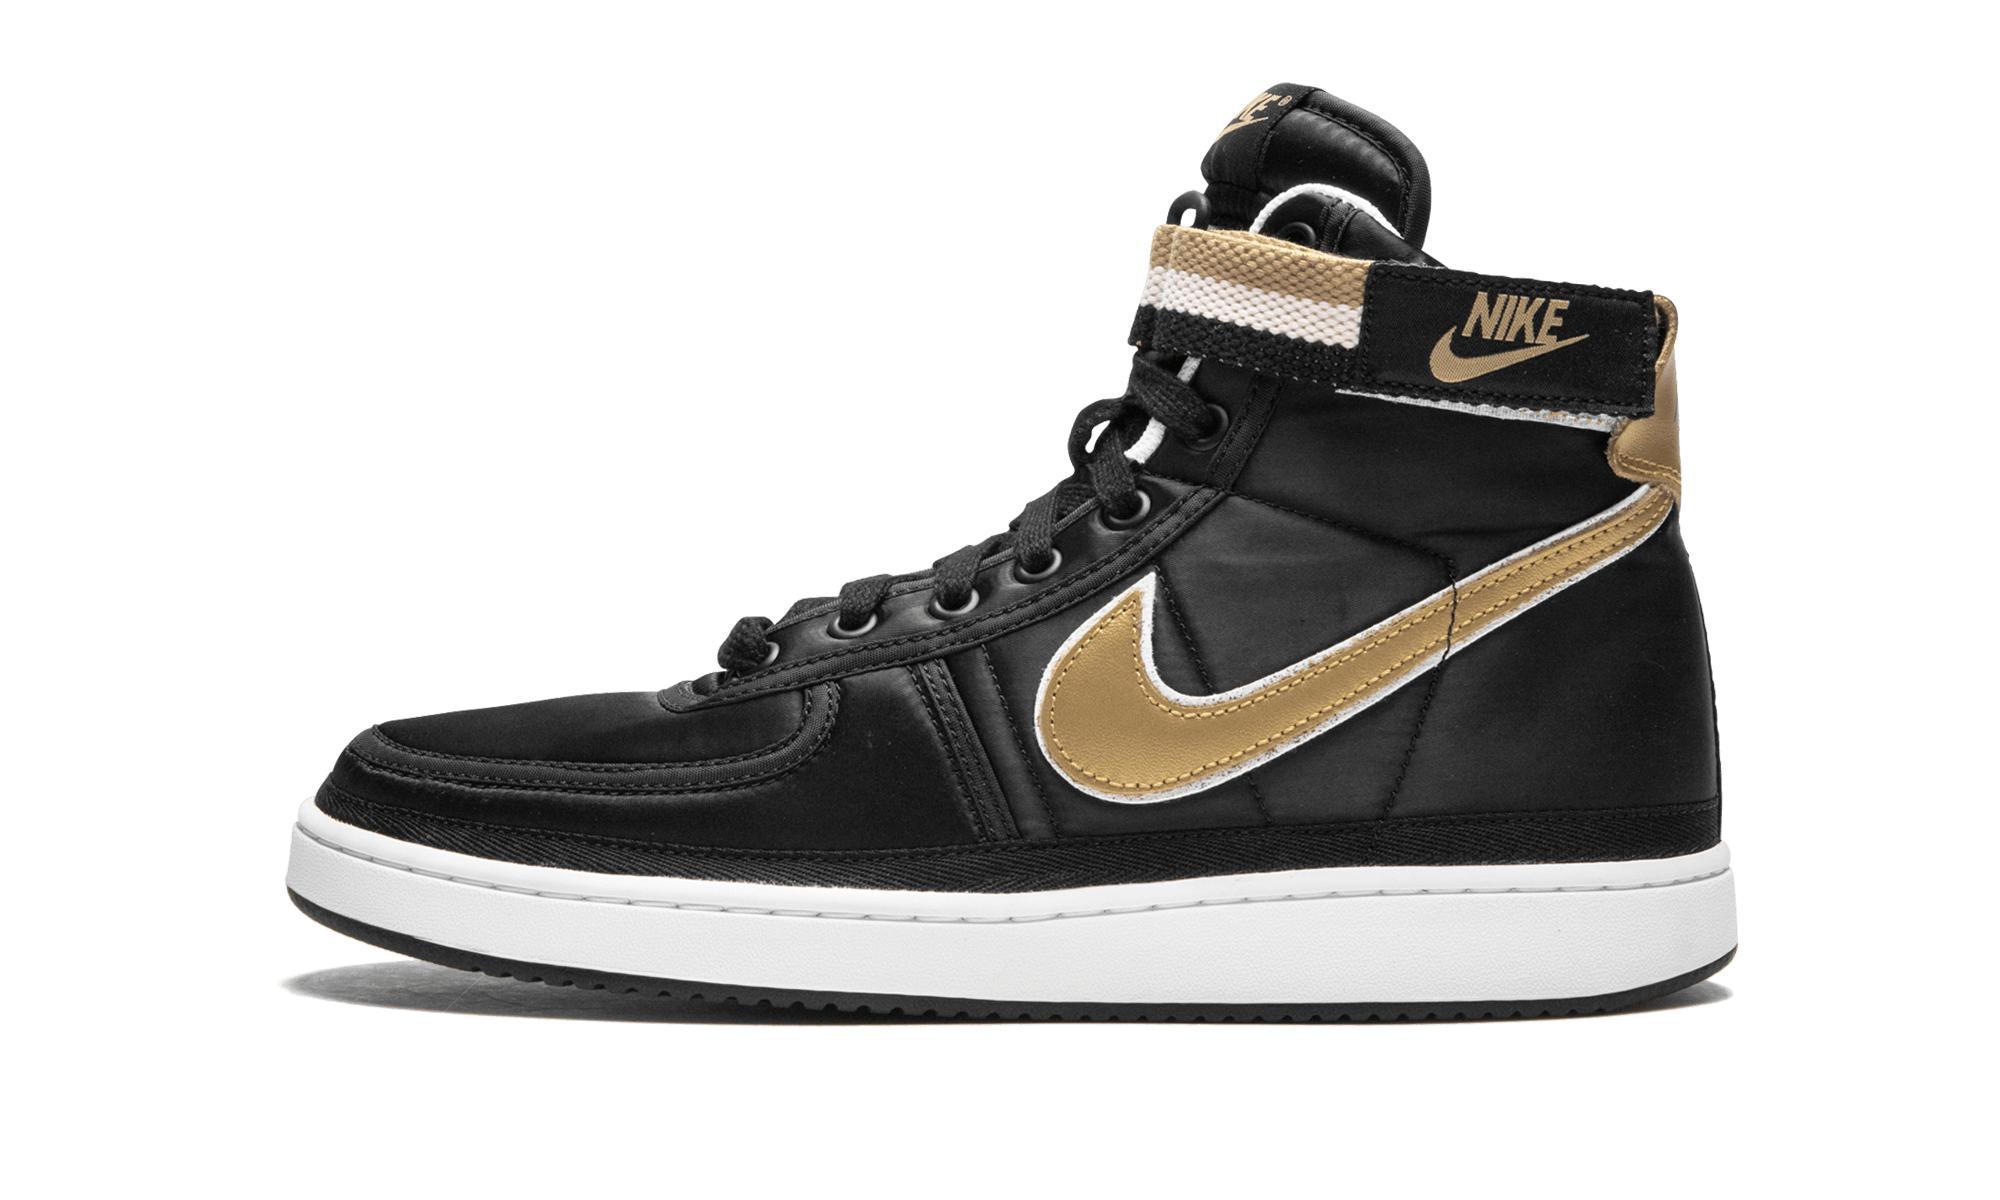 92b08e297c0e Lyst - Nike Vandal High Supreme Qs in Black for Men